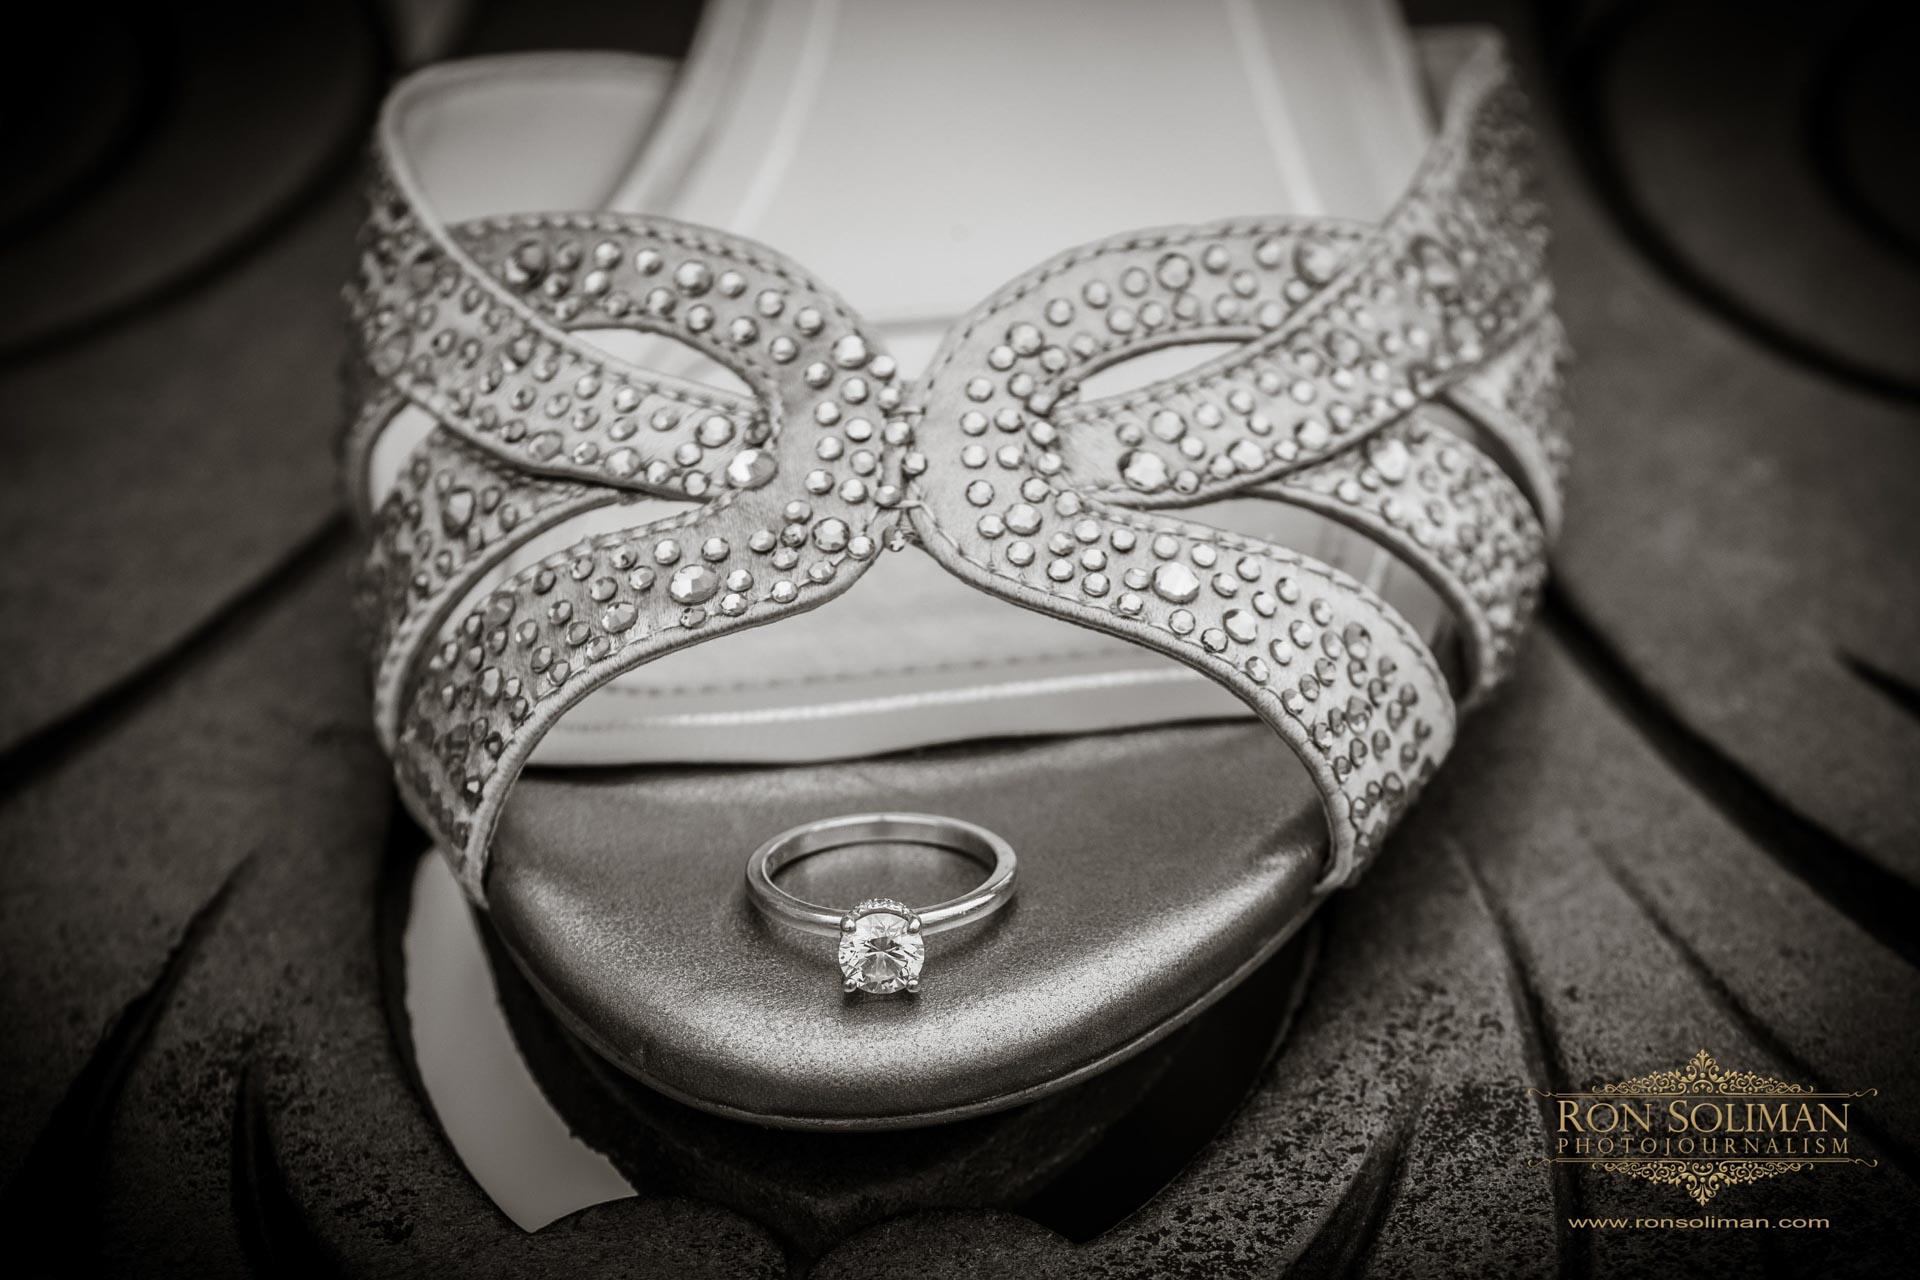 THE MERION WEDDING 5